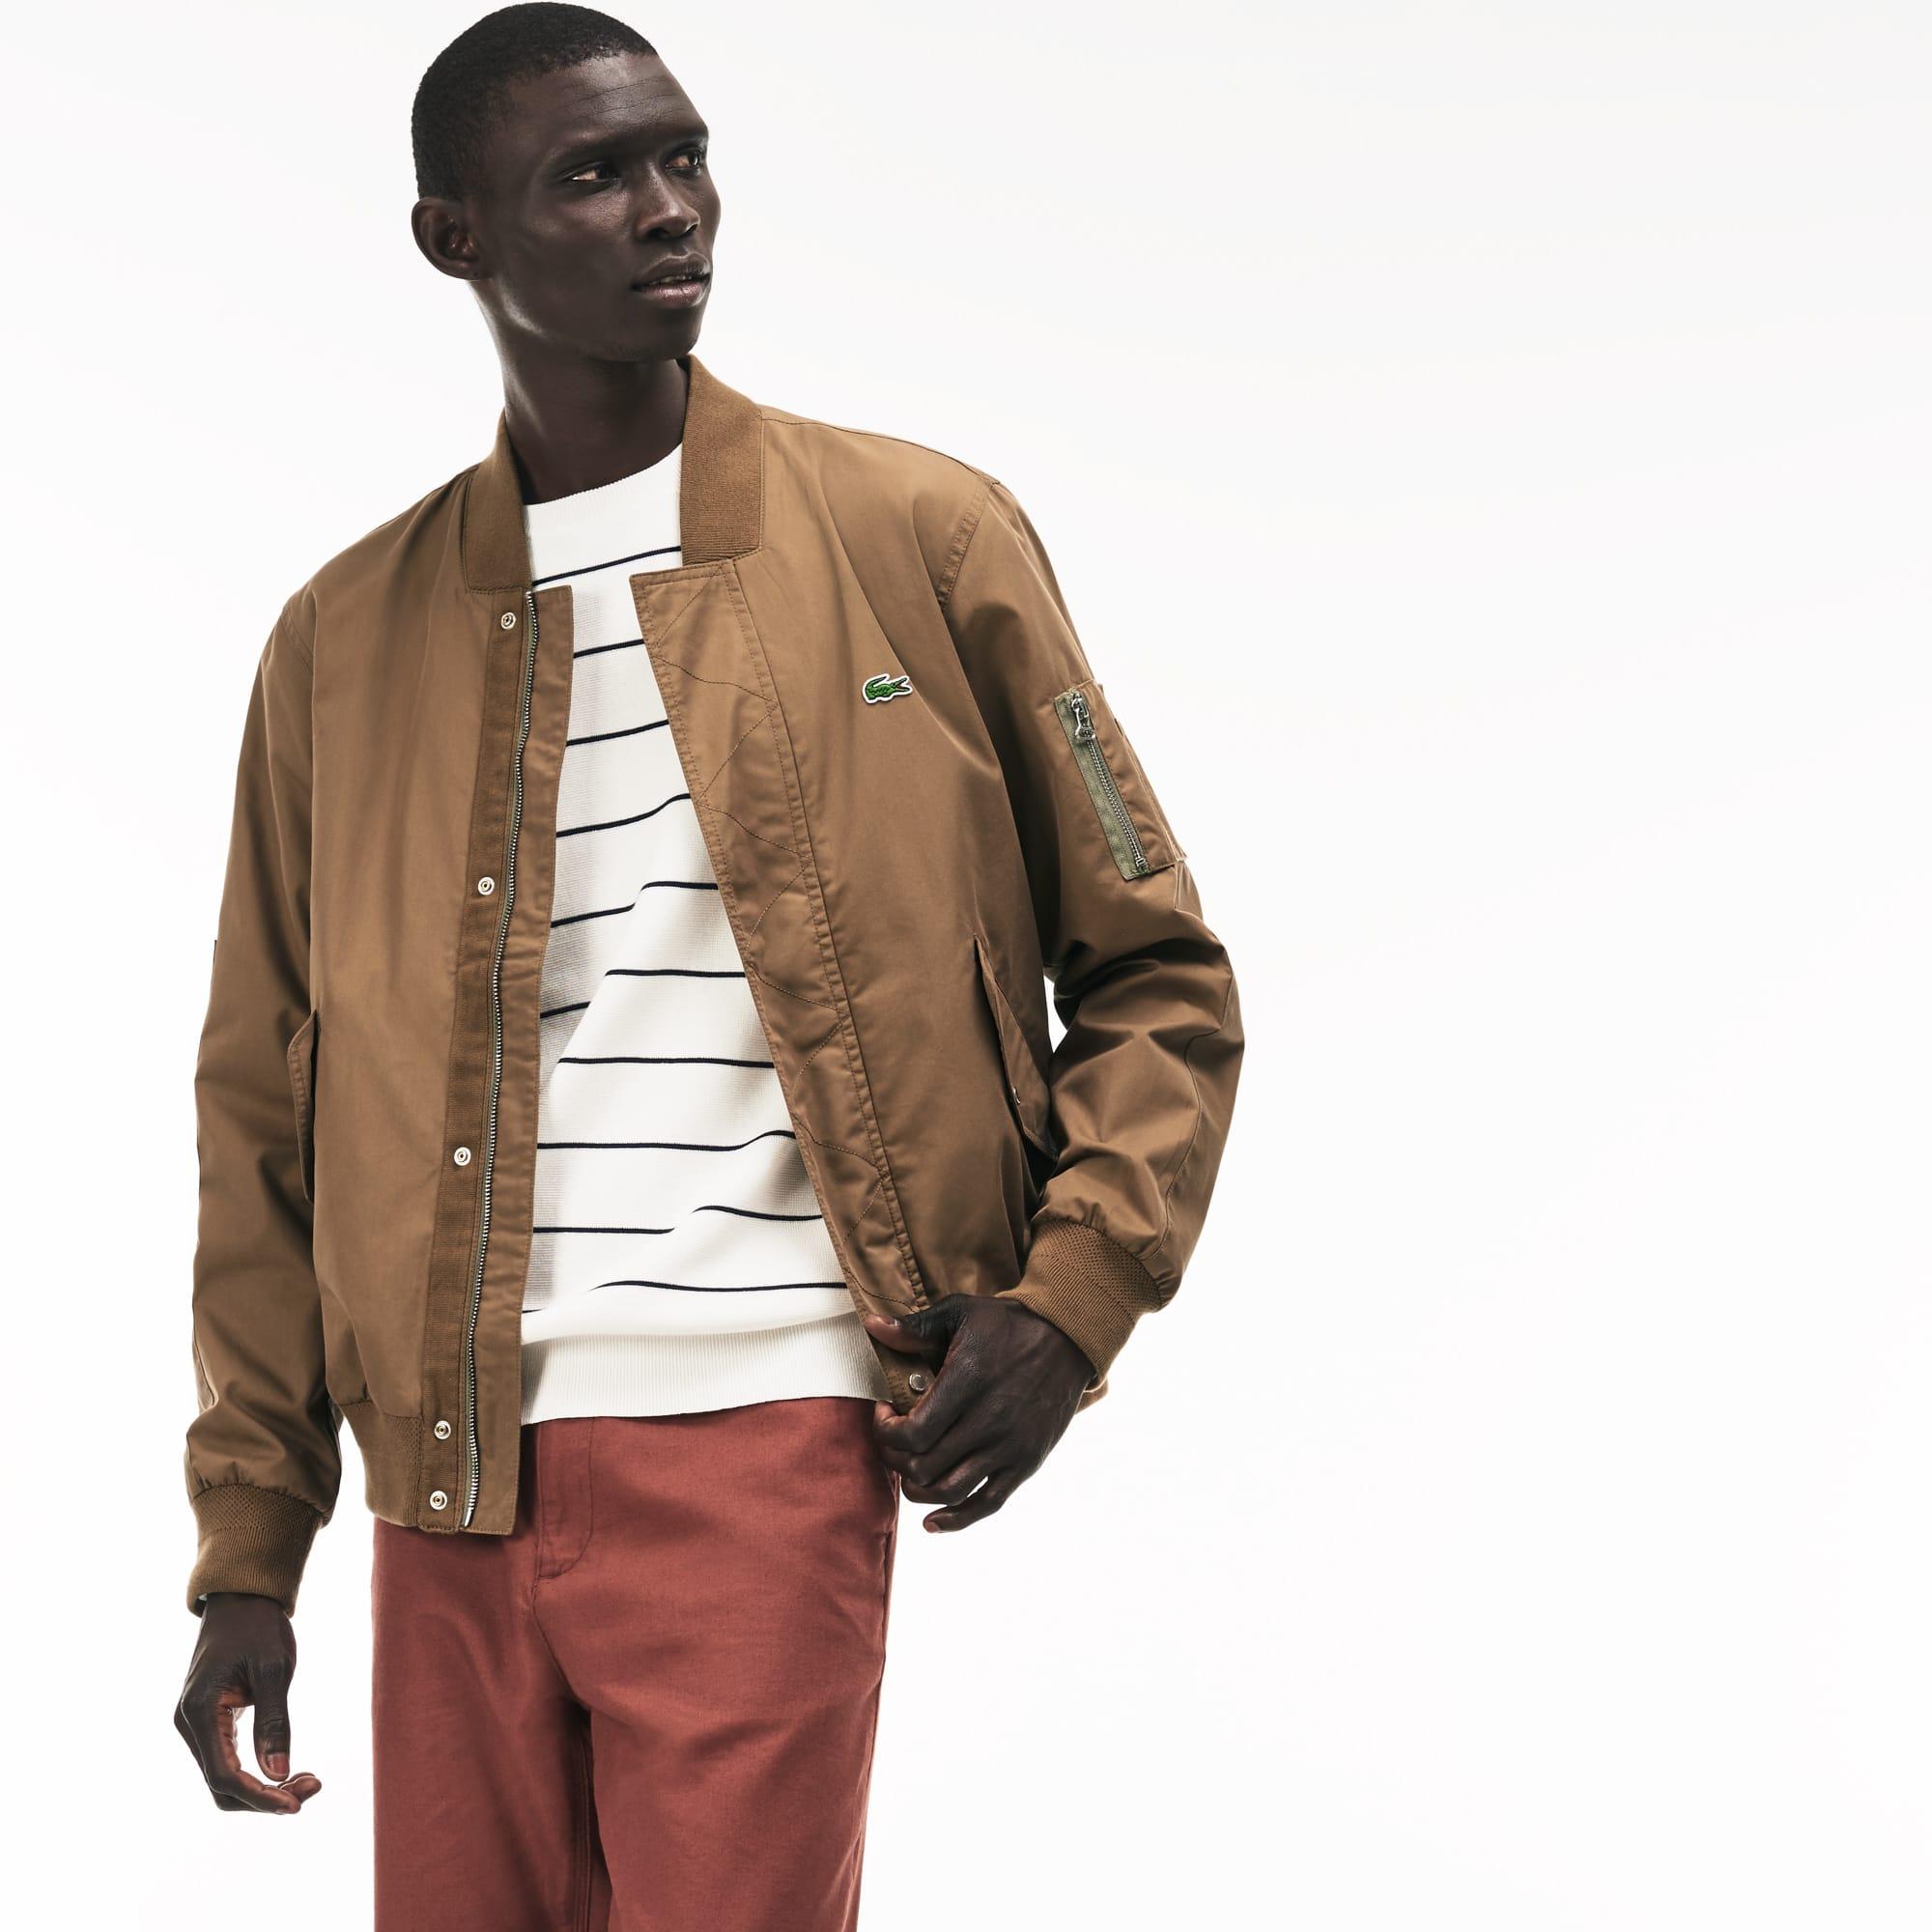 Men's Lightweight Texturized Cotton Bomber